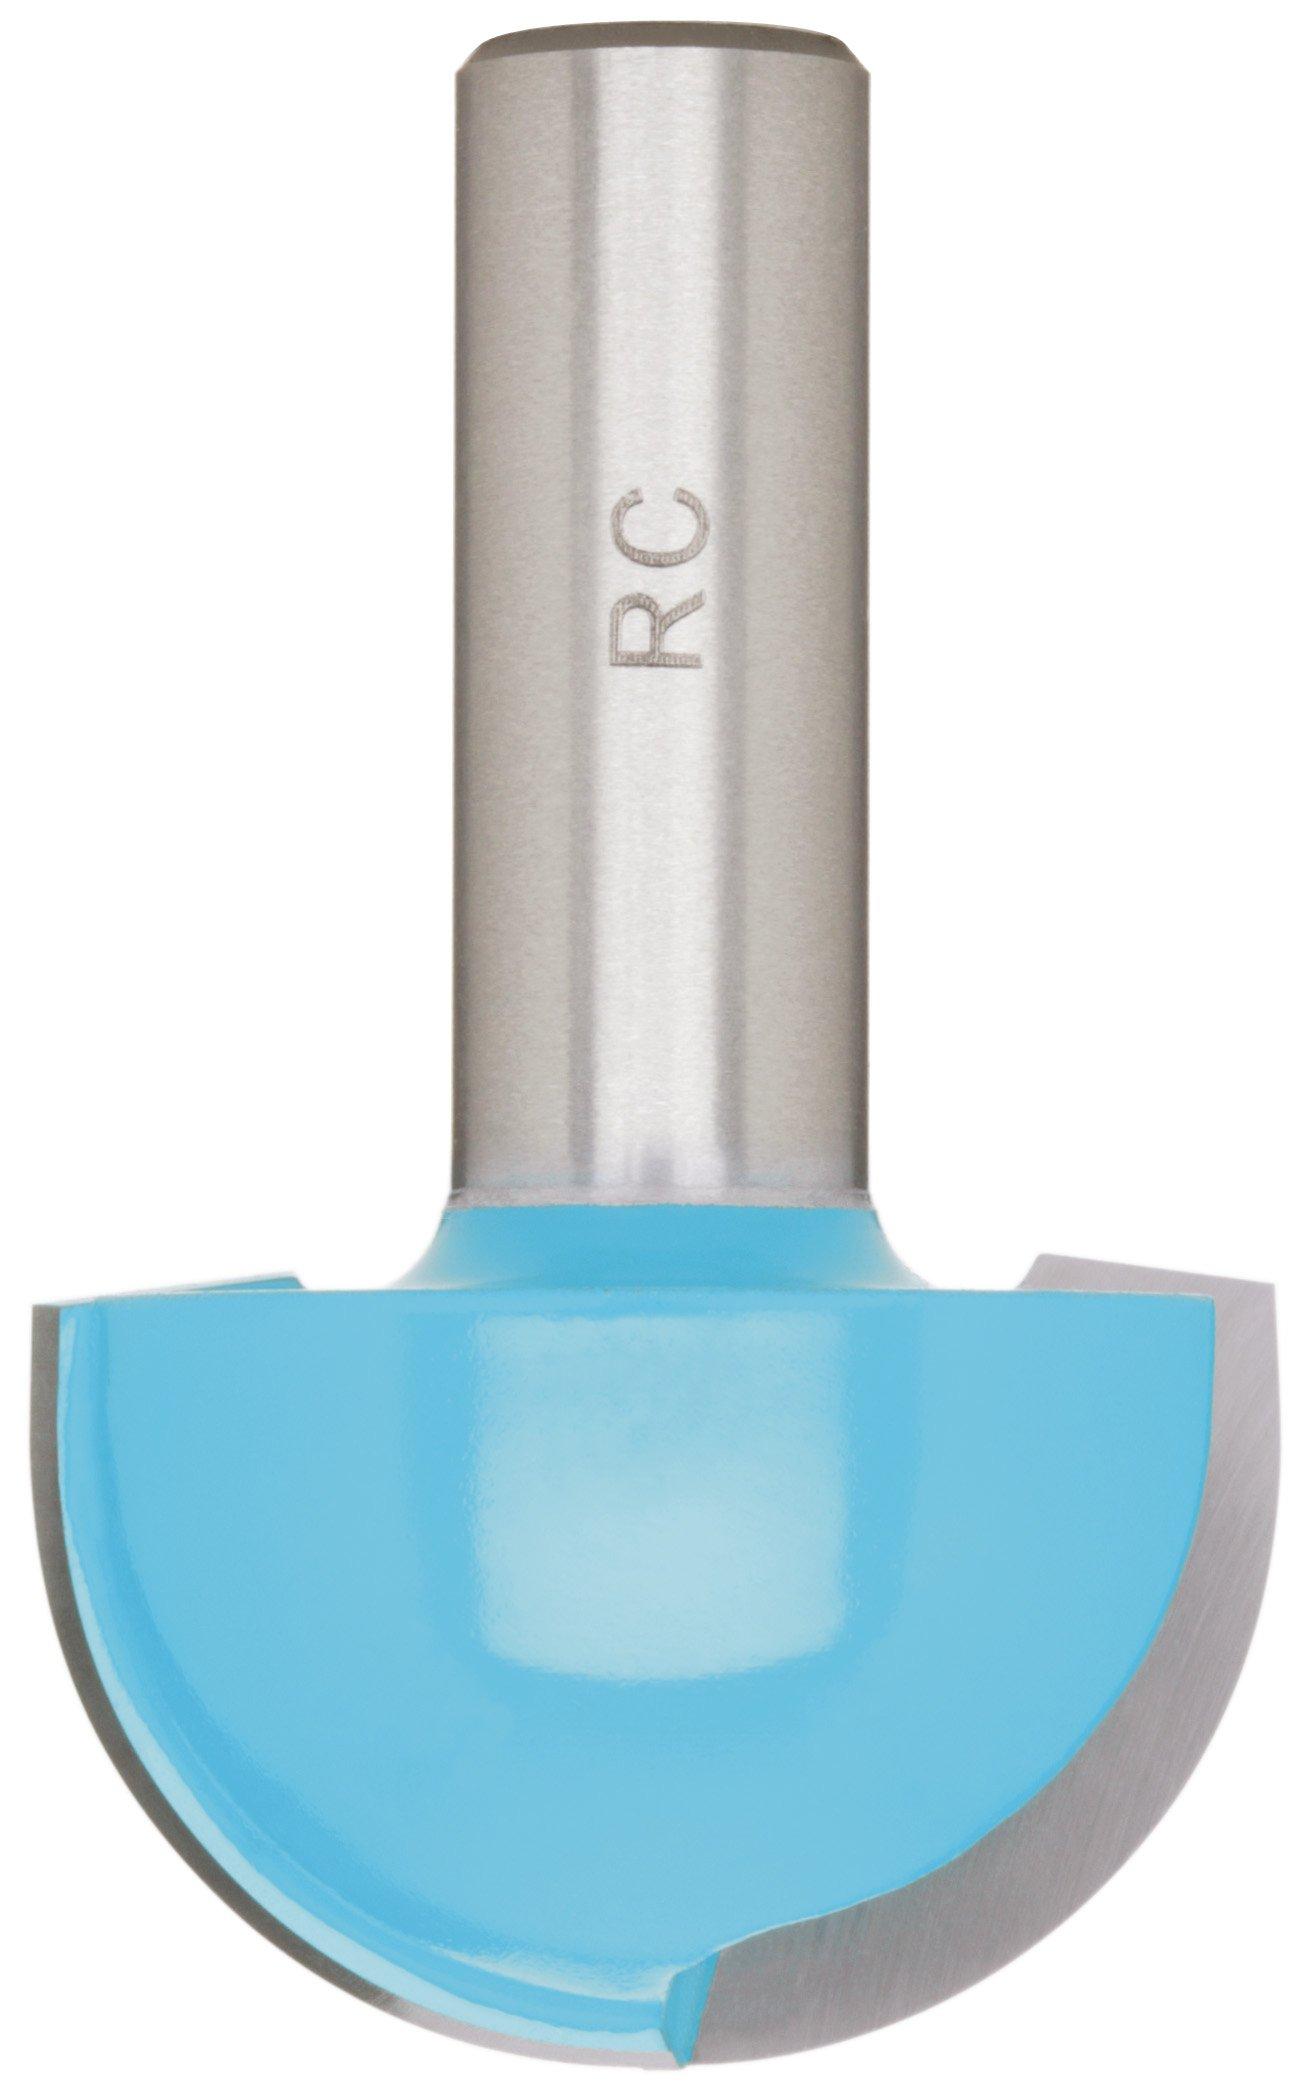 Roman Carbide DC1065 1-1/2-Inch Round Nose, 1/2-Inch Shank